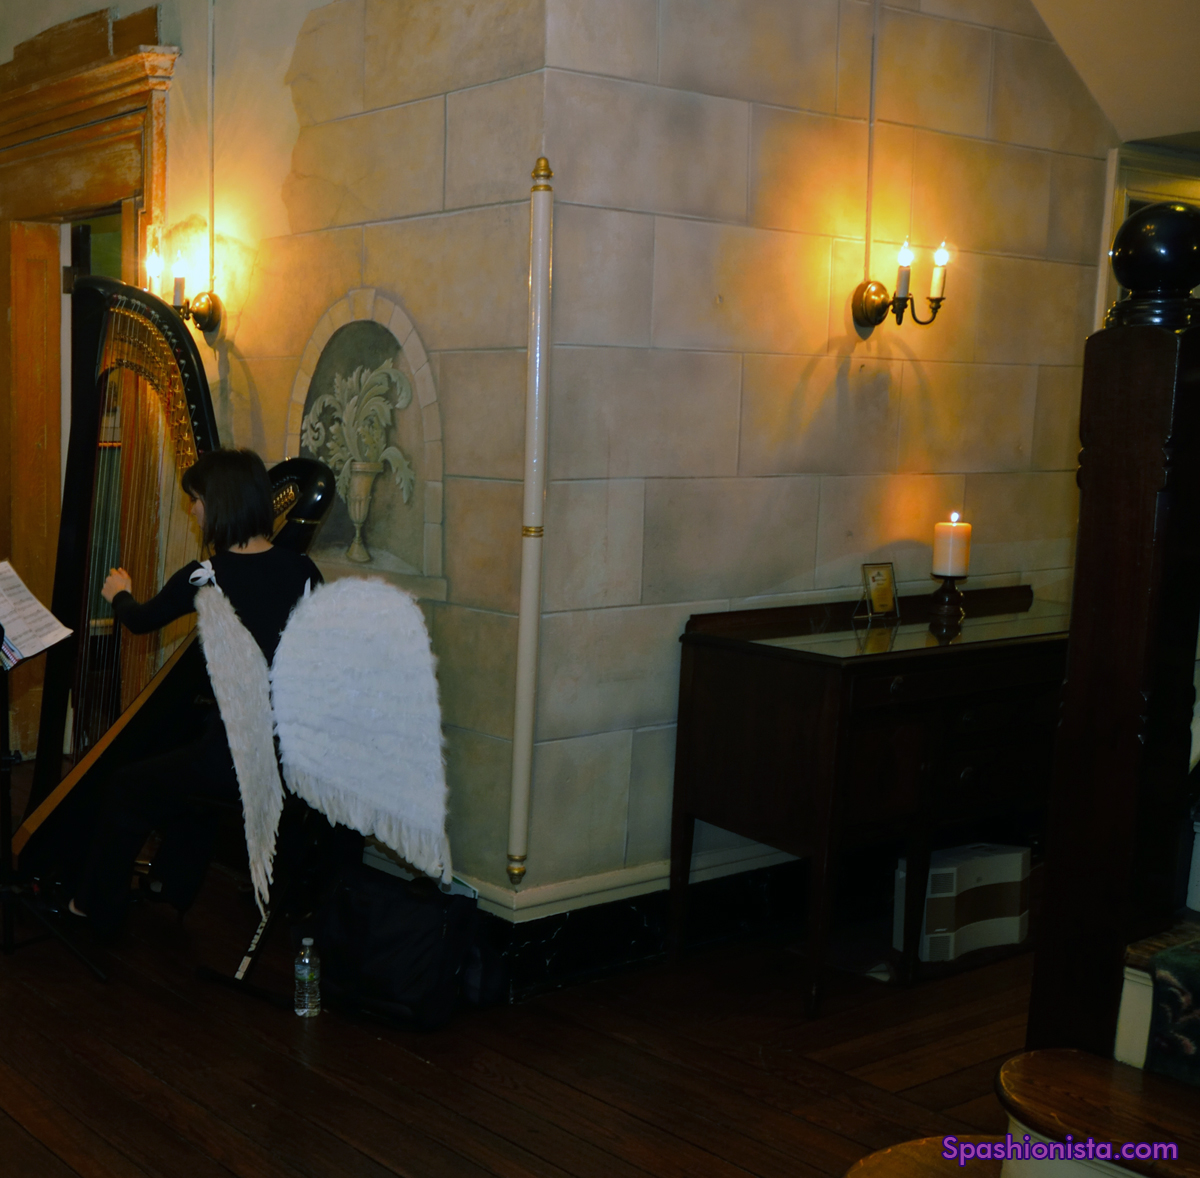 An angelic harp player